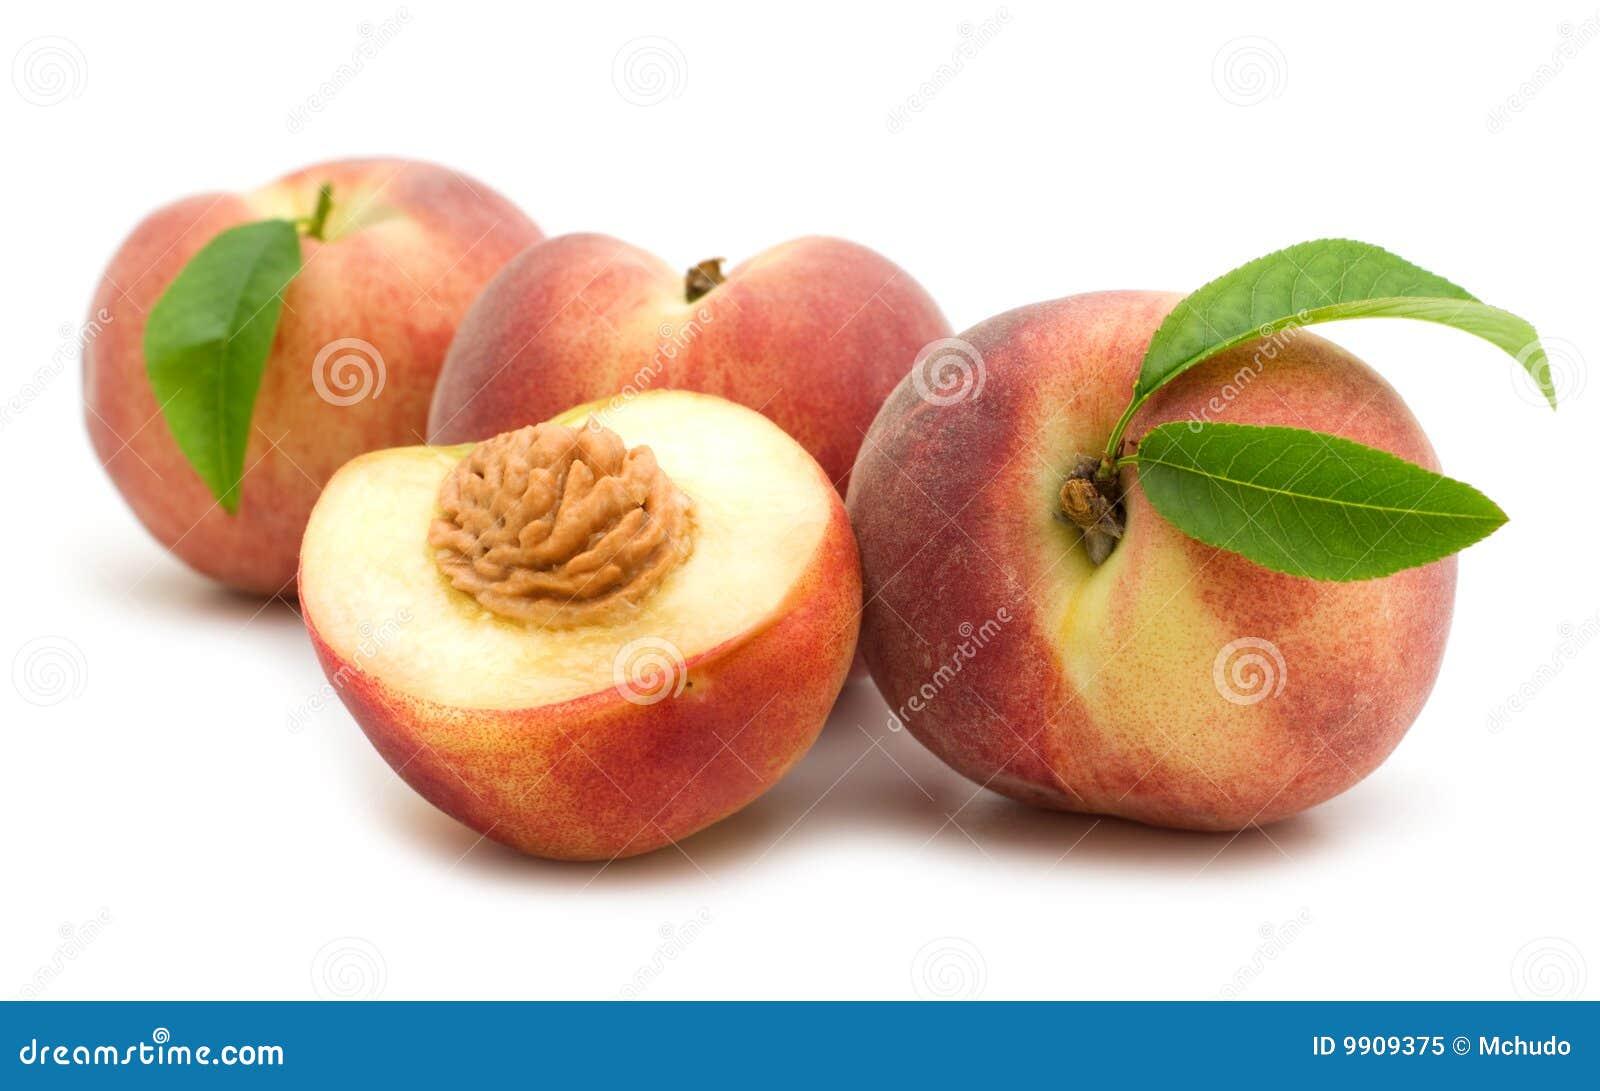 Peach Slice Royalty-Free Stock Photography | CartoonDealer ...